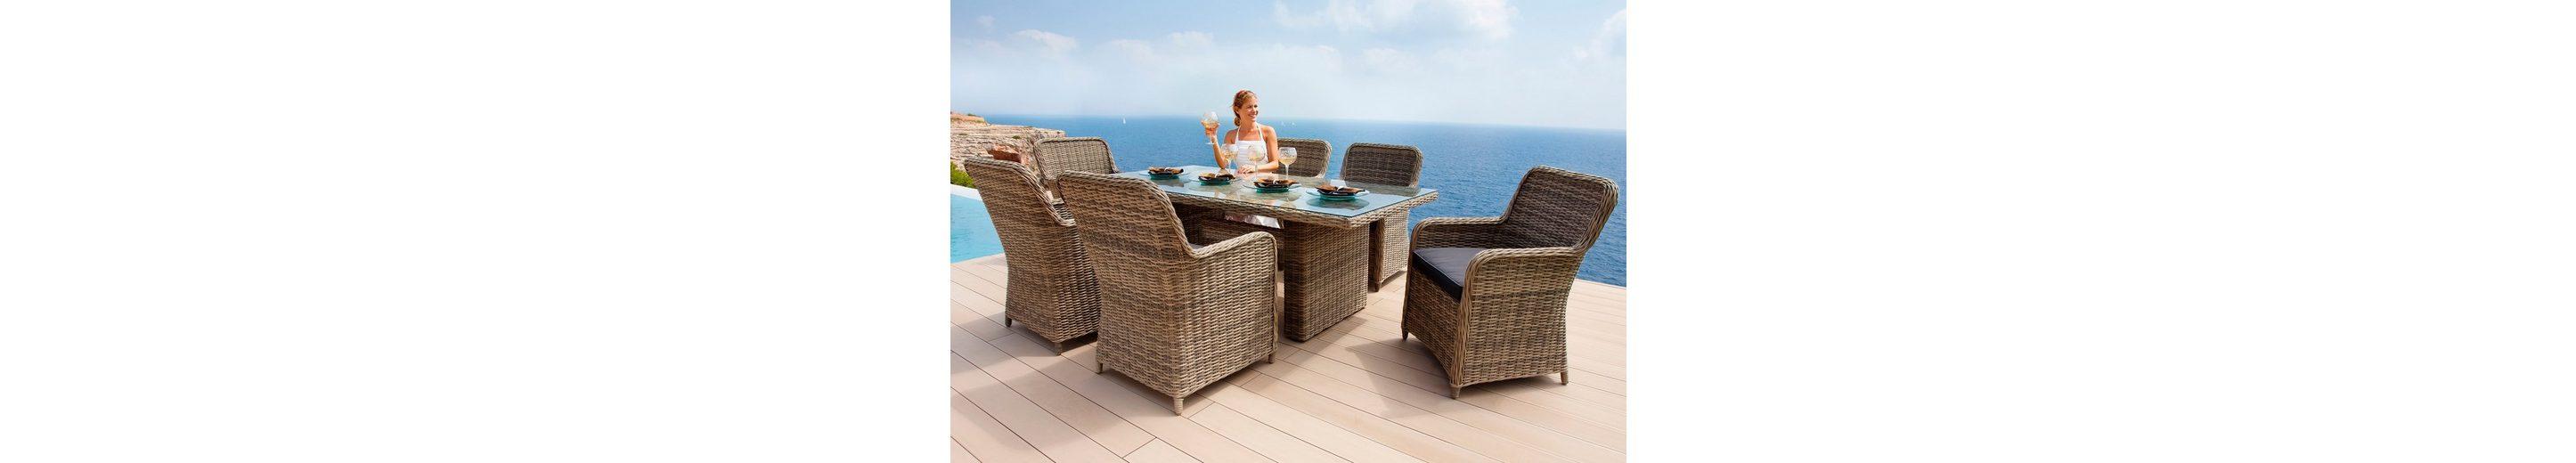 13-tgl. Gartenmöbelset »Korsika«, 6 Sessel, Tisch 200x100 cm, Polyrattan, braun